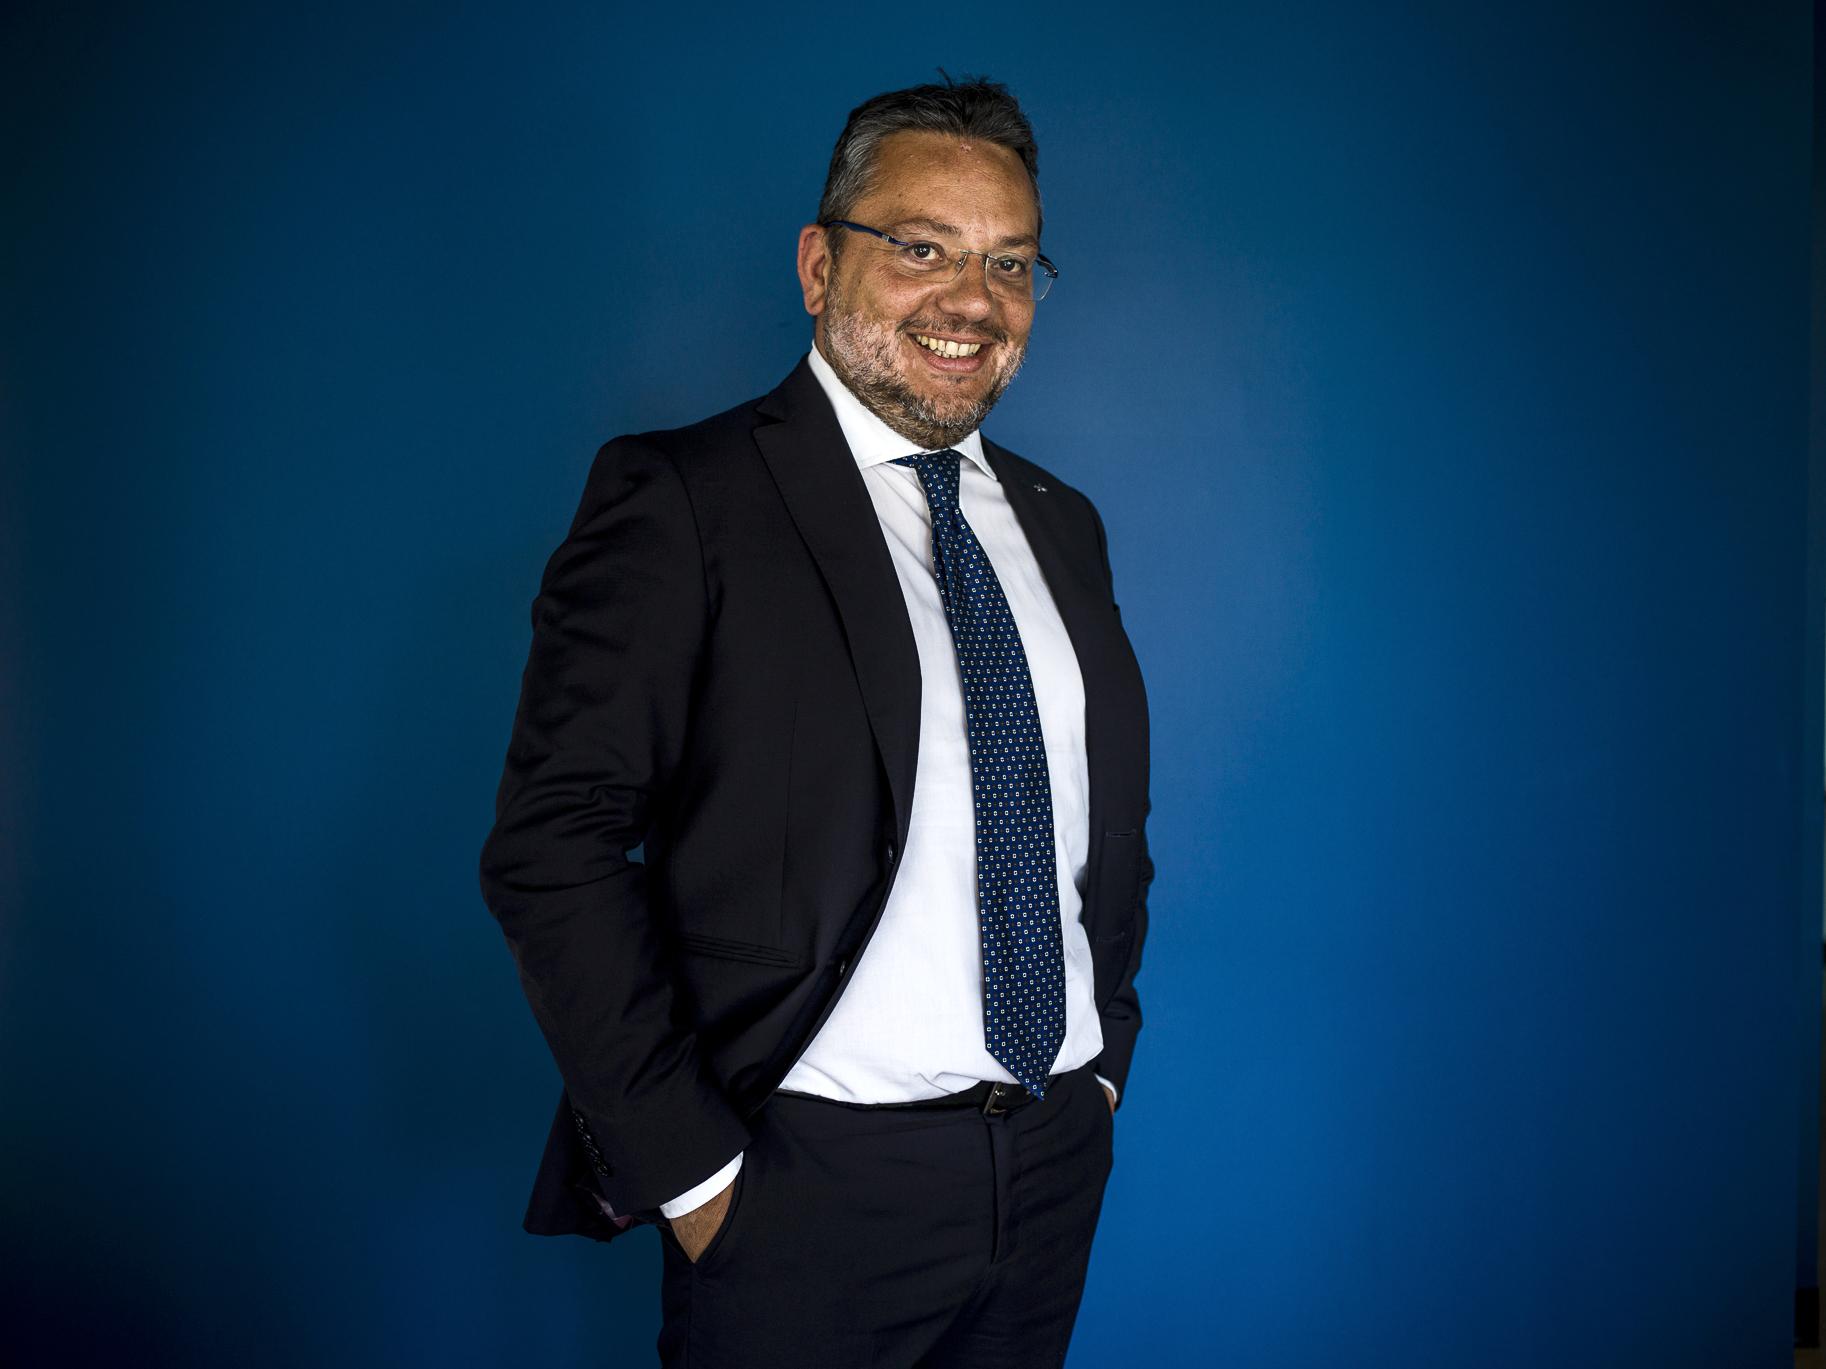 Fernando_Diana_CEO_Citynews-4